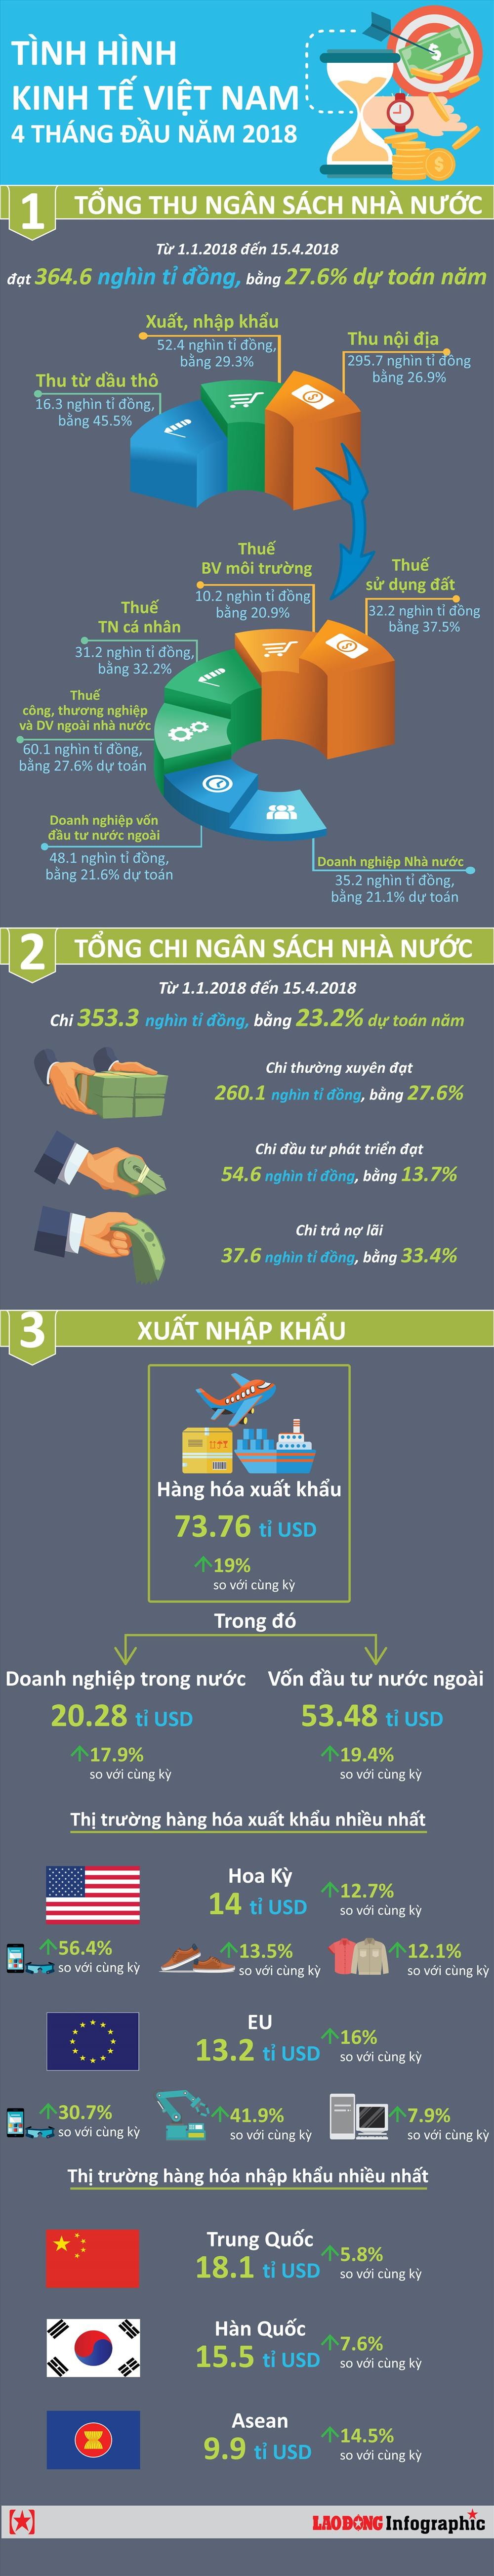 infographic buc tranh kinh te viet nam 4 thang dau nam 2018